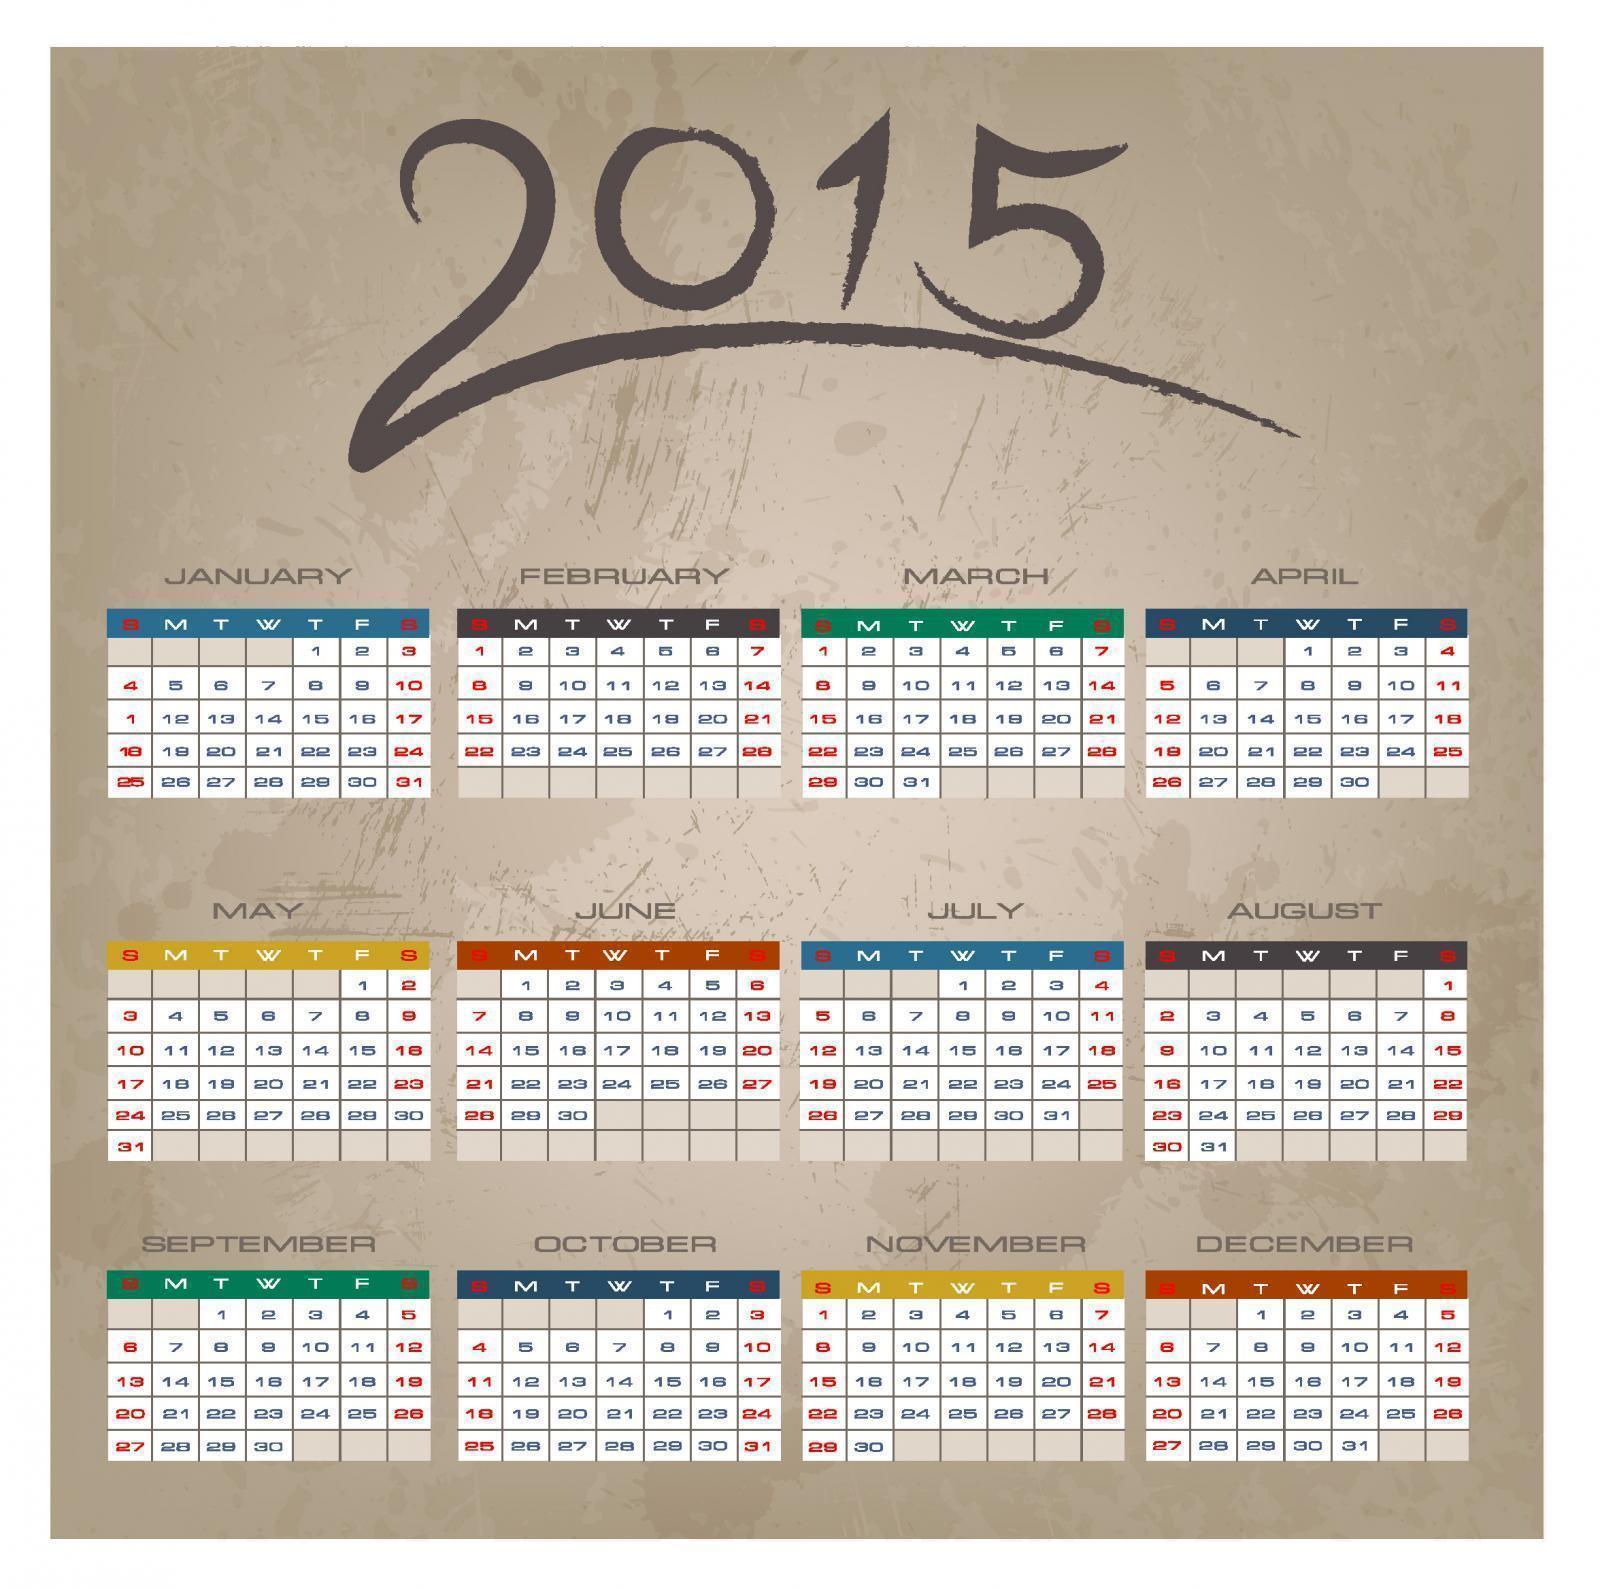 Calendar On Wallpaper Mac : Playboy mac wallpapers wallpaper cave